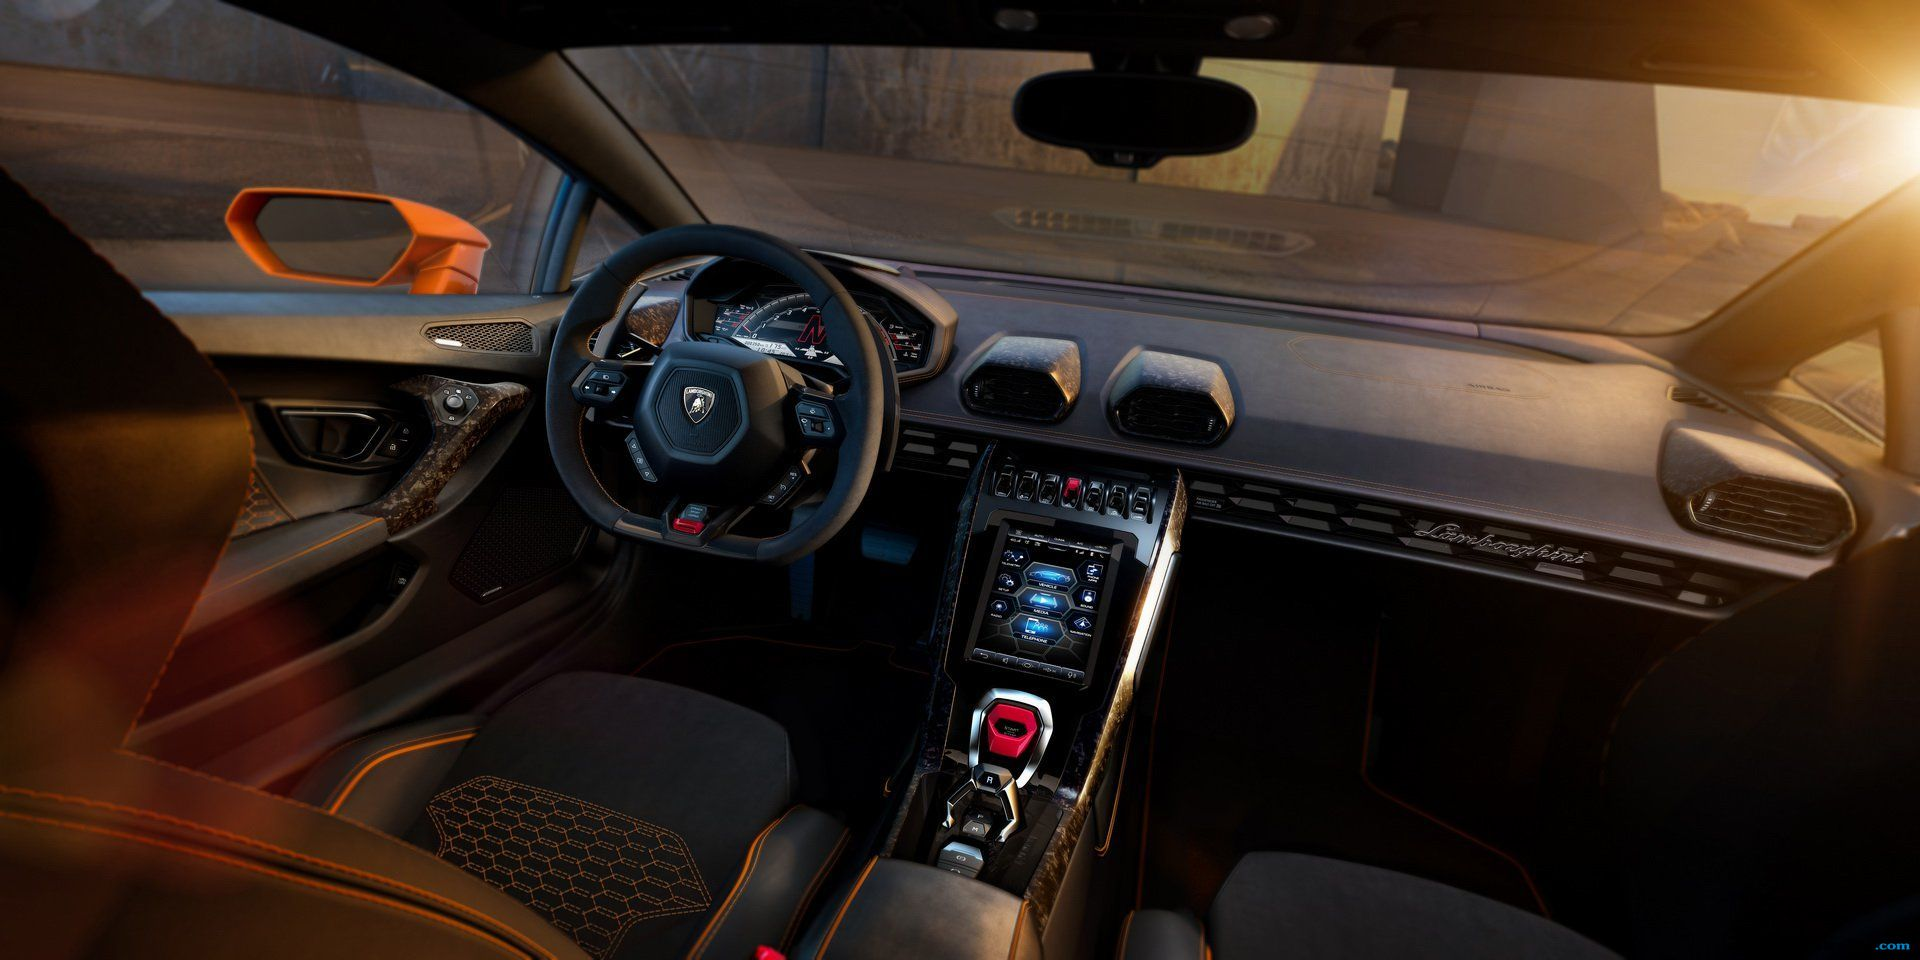 Penampakan Lamborghini Huracan Evo 2020, Termahal Dijual Rp 6,8 M